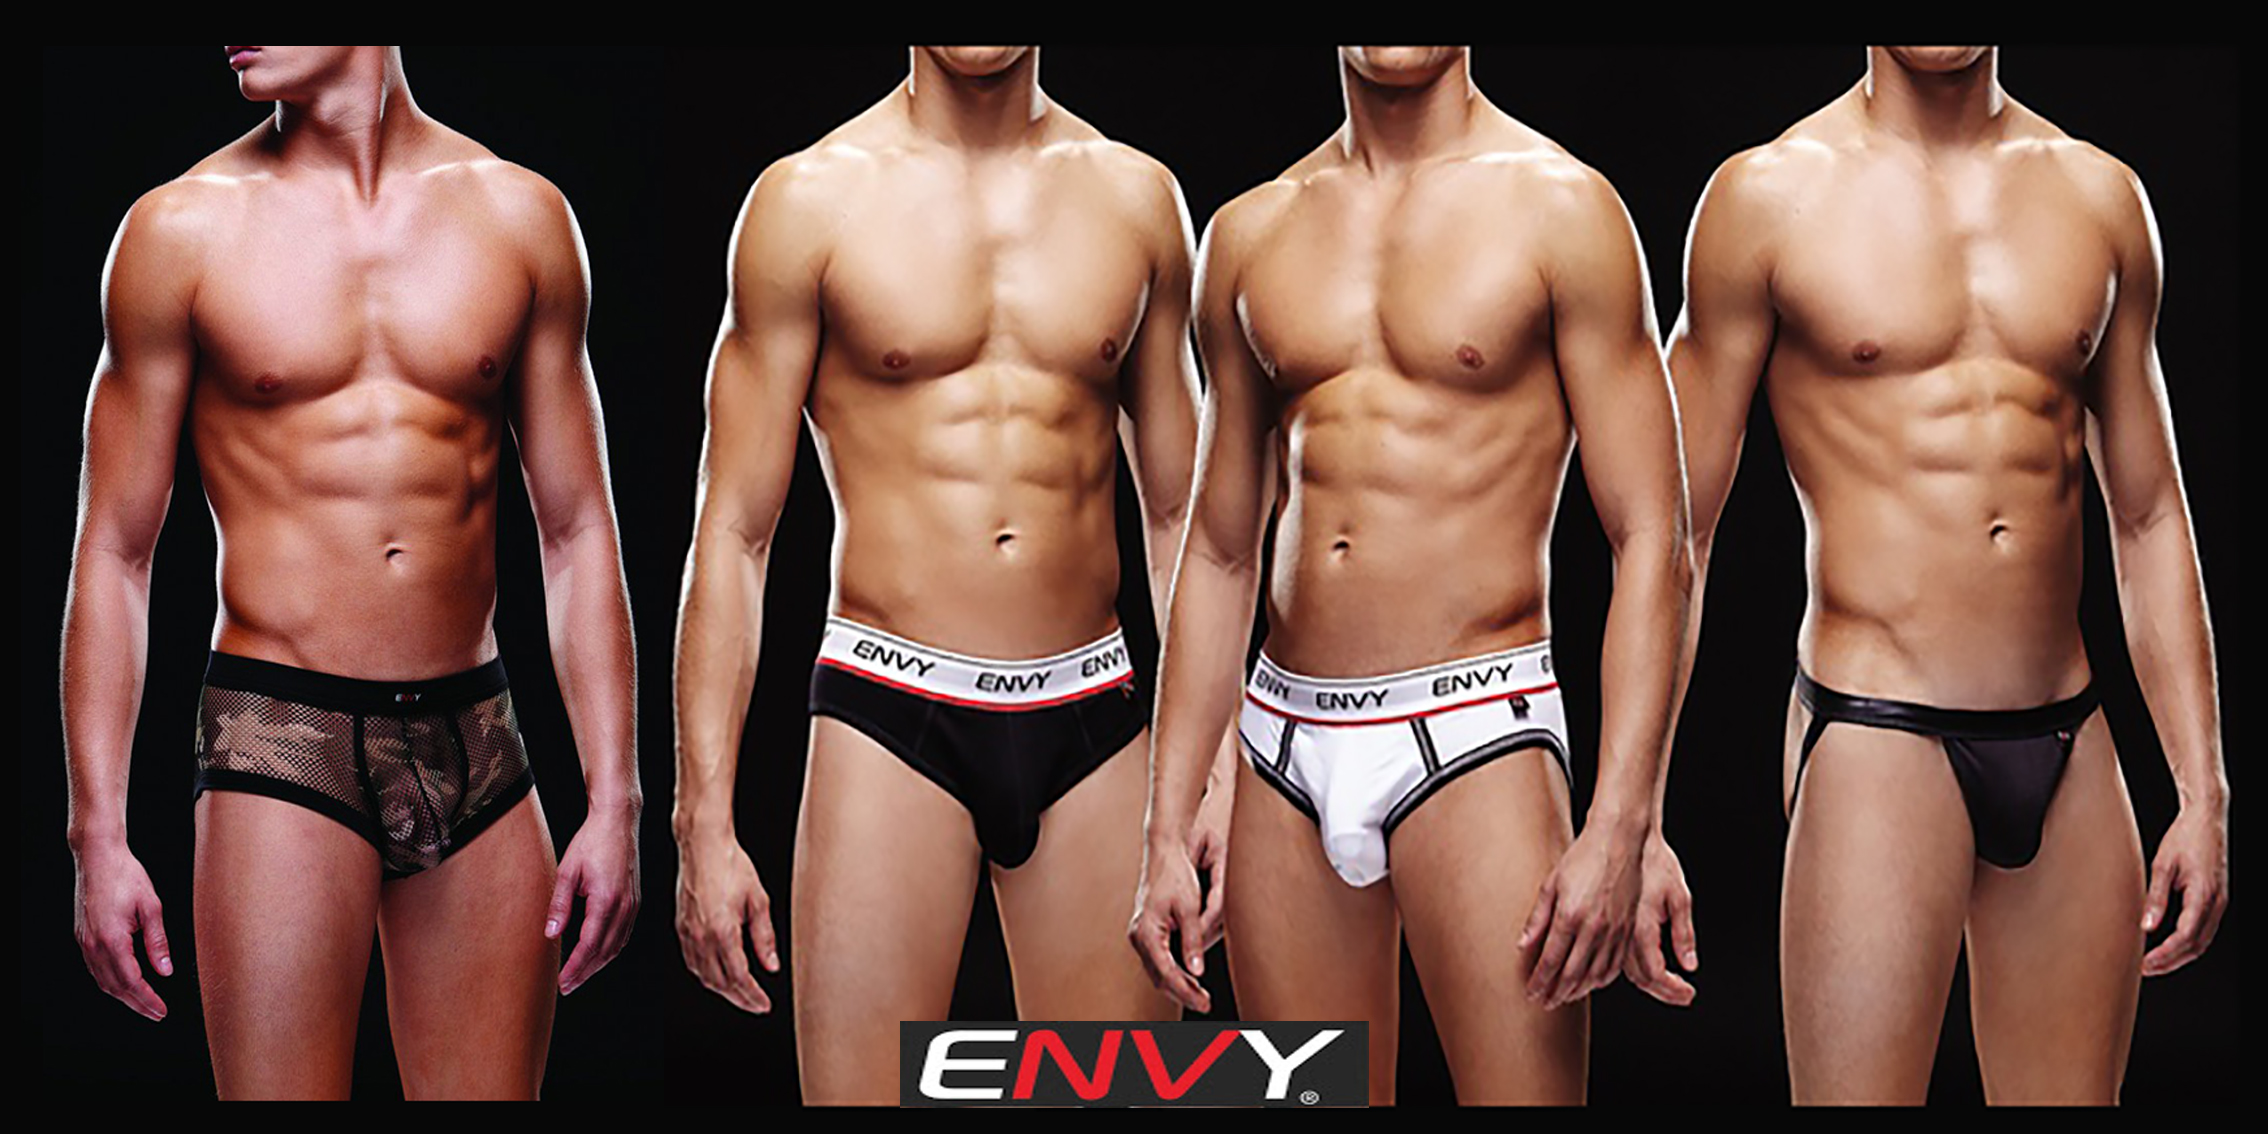 envy-underwear.jpg